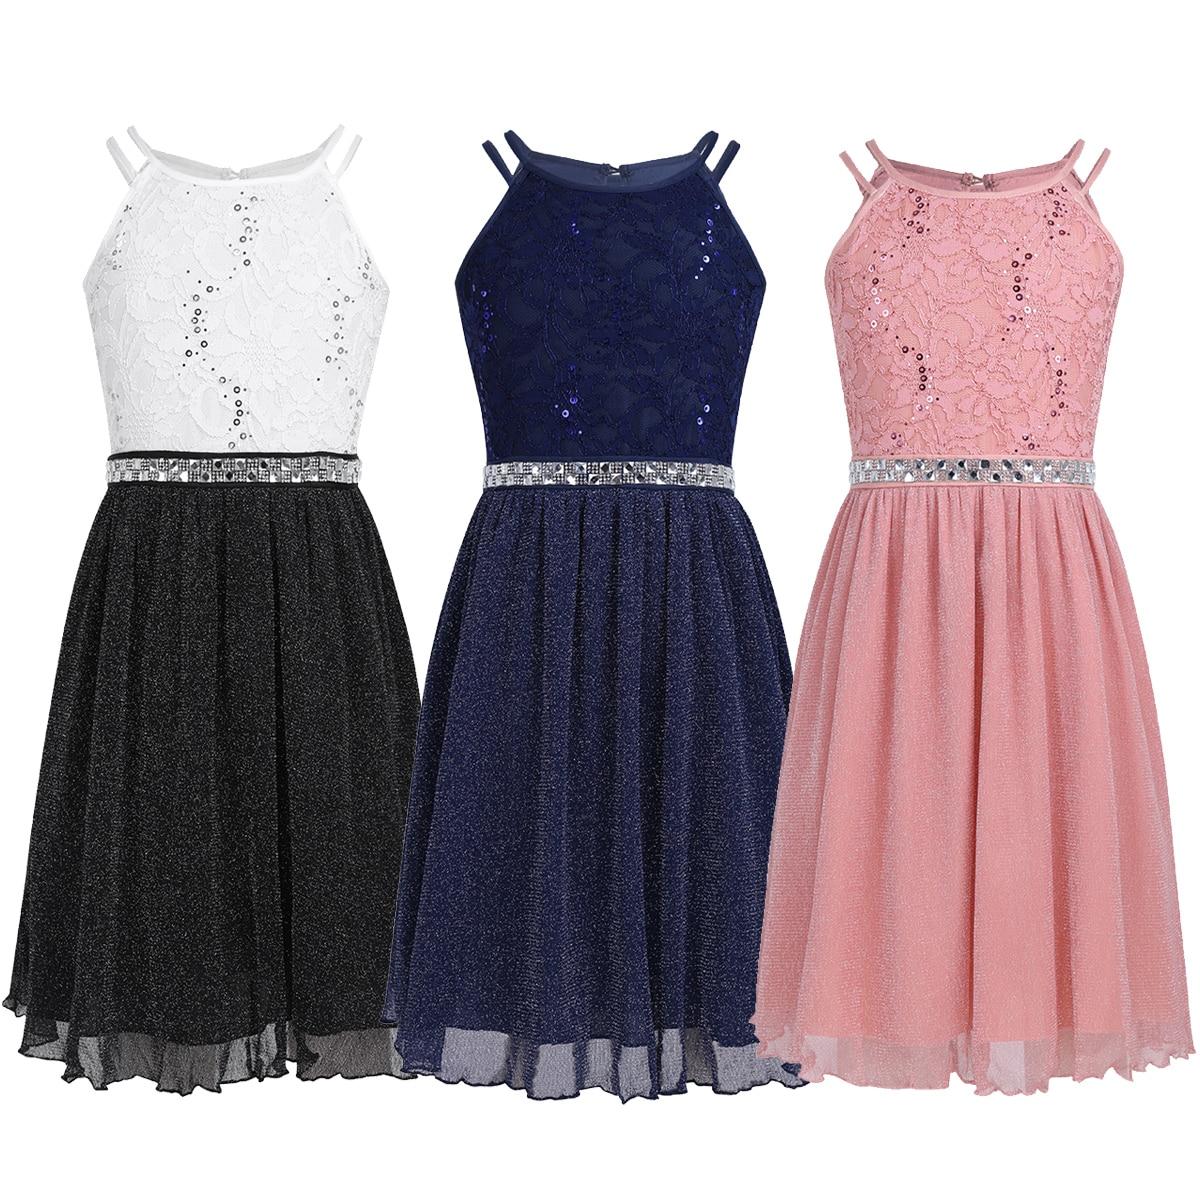 iiniim Teen Girls Sleeveless Sequined Floral Lace Shiny Dress Vestido de festa for Weeding Formal Birthday Party Summer Dresses 2